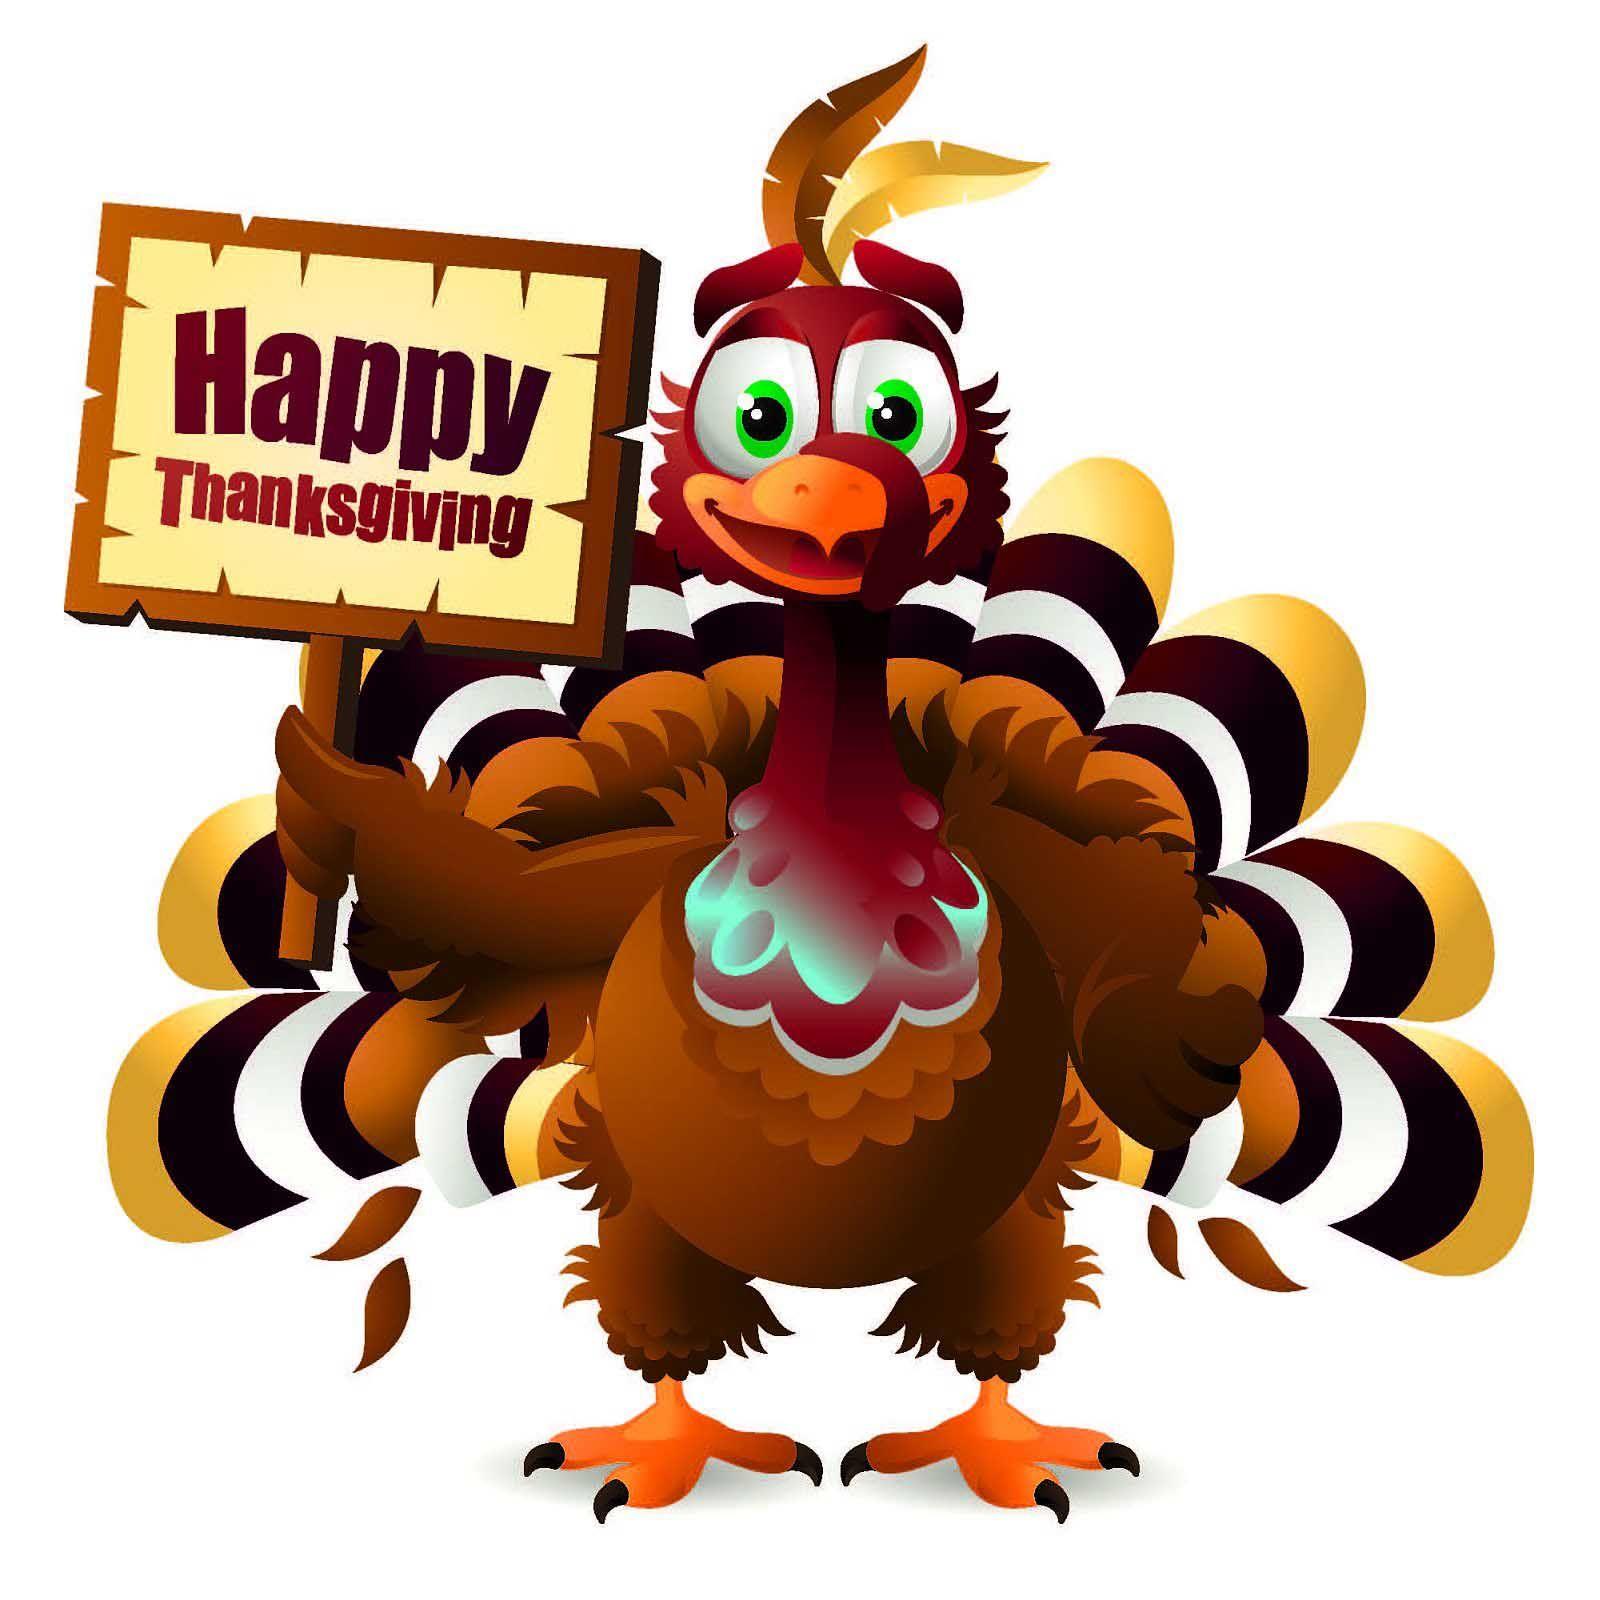 Yummy Thanksgiving Turkey Wallpapers for Desktop.